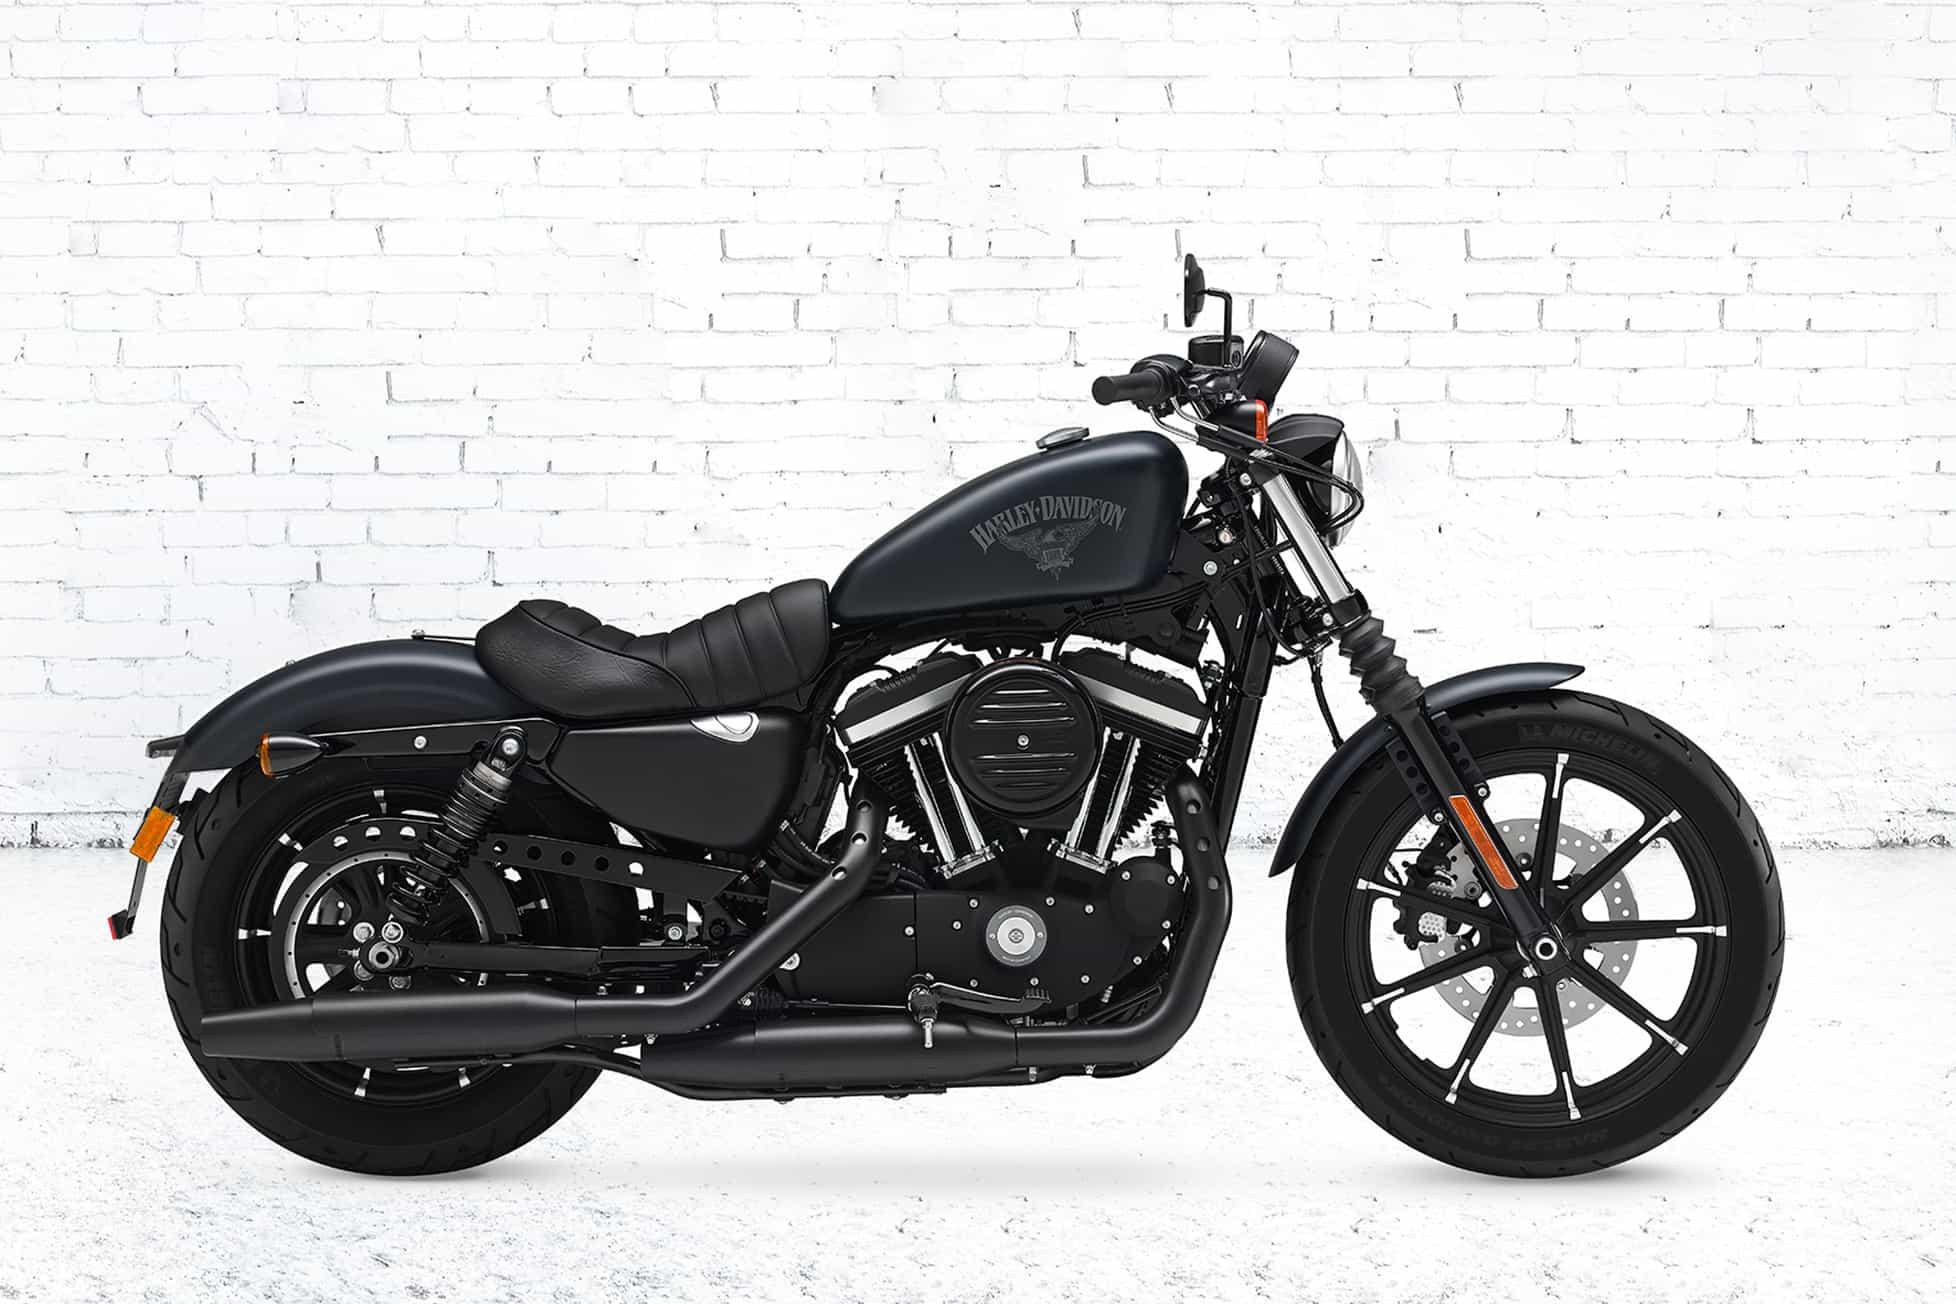 2018 sportster iron 883 specs pricing harley davidson uk rh harley davidson  com Harley-Davidson Sportster 883 Super Low 2008 harley davidson sportster  ...